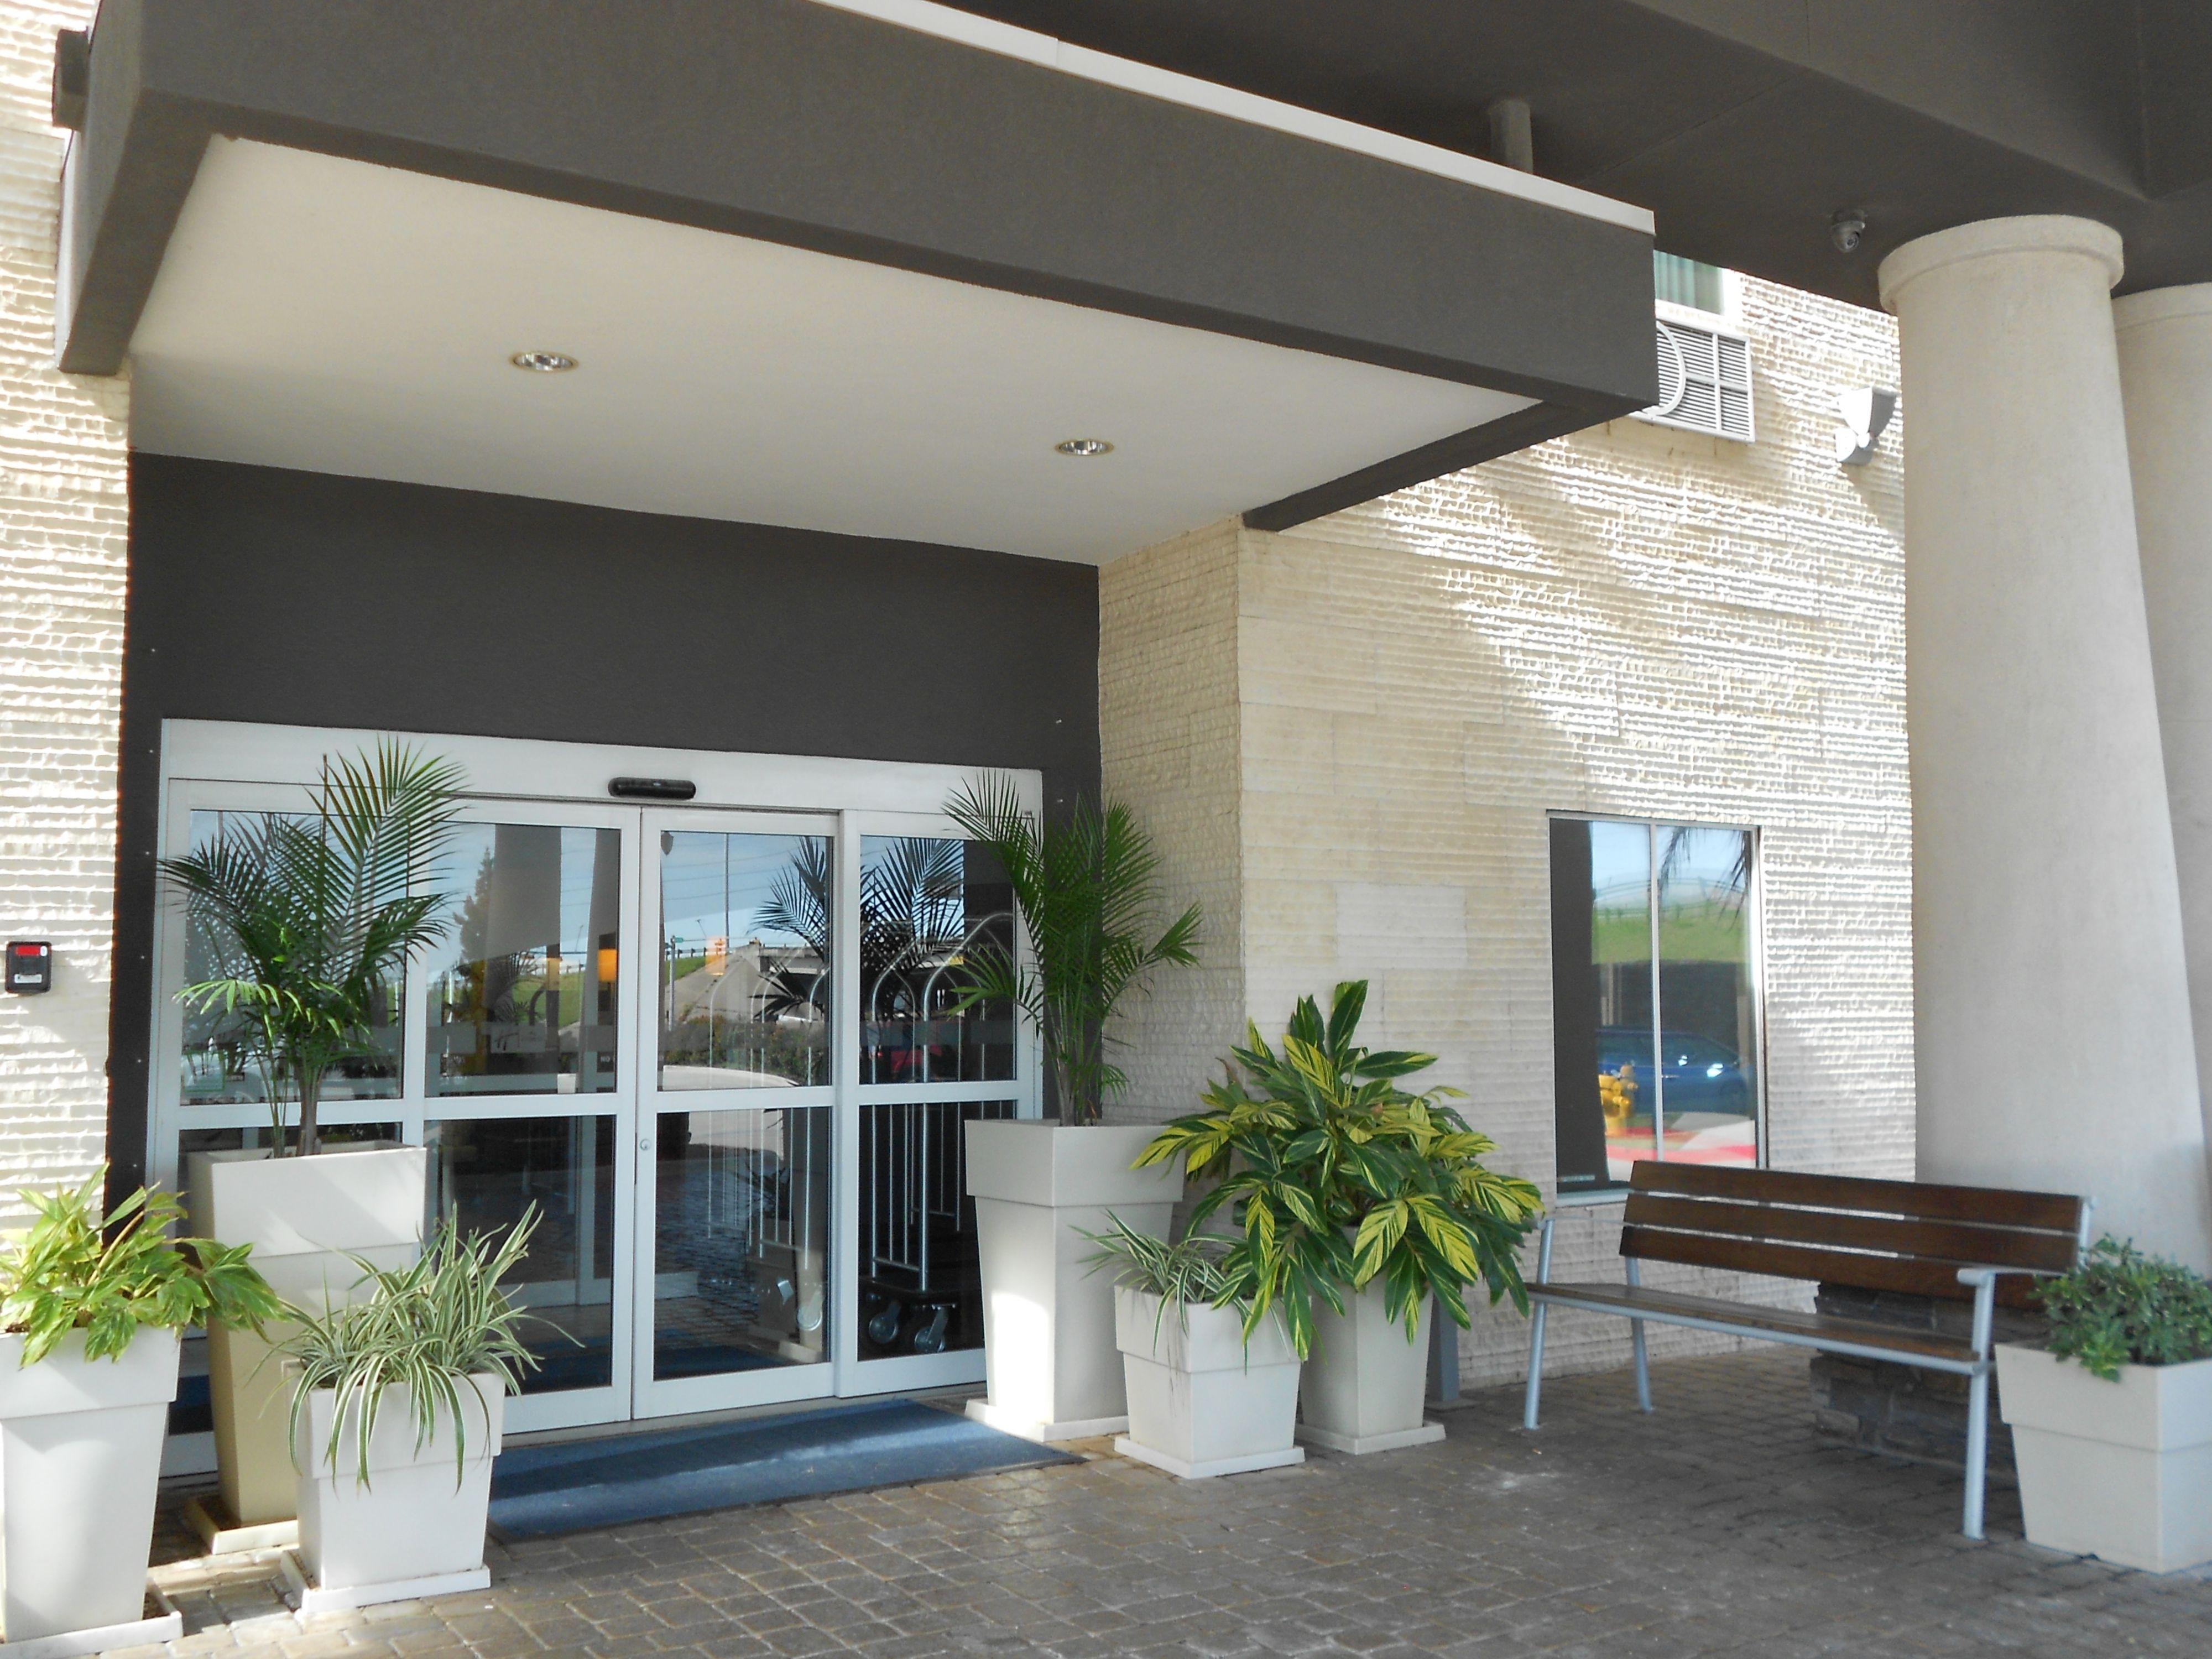 Holiday Inn Express & Suites Corona image 5